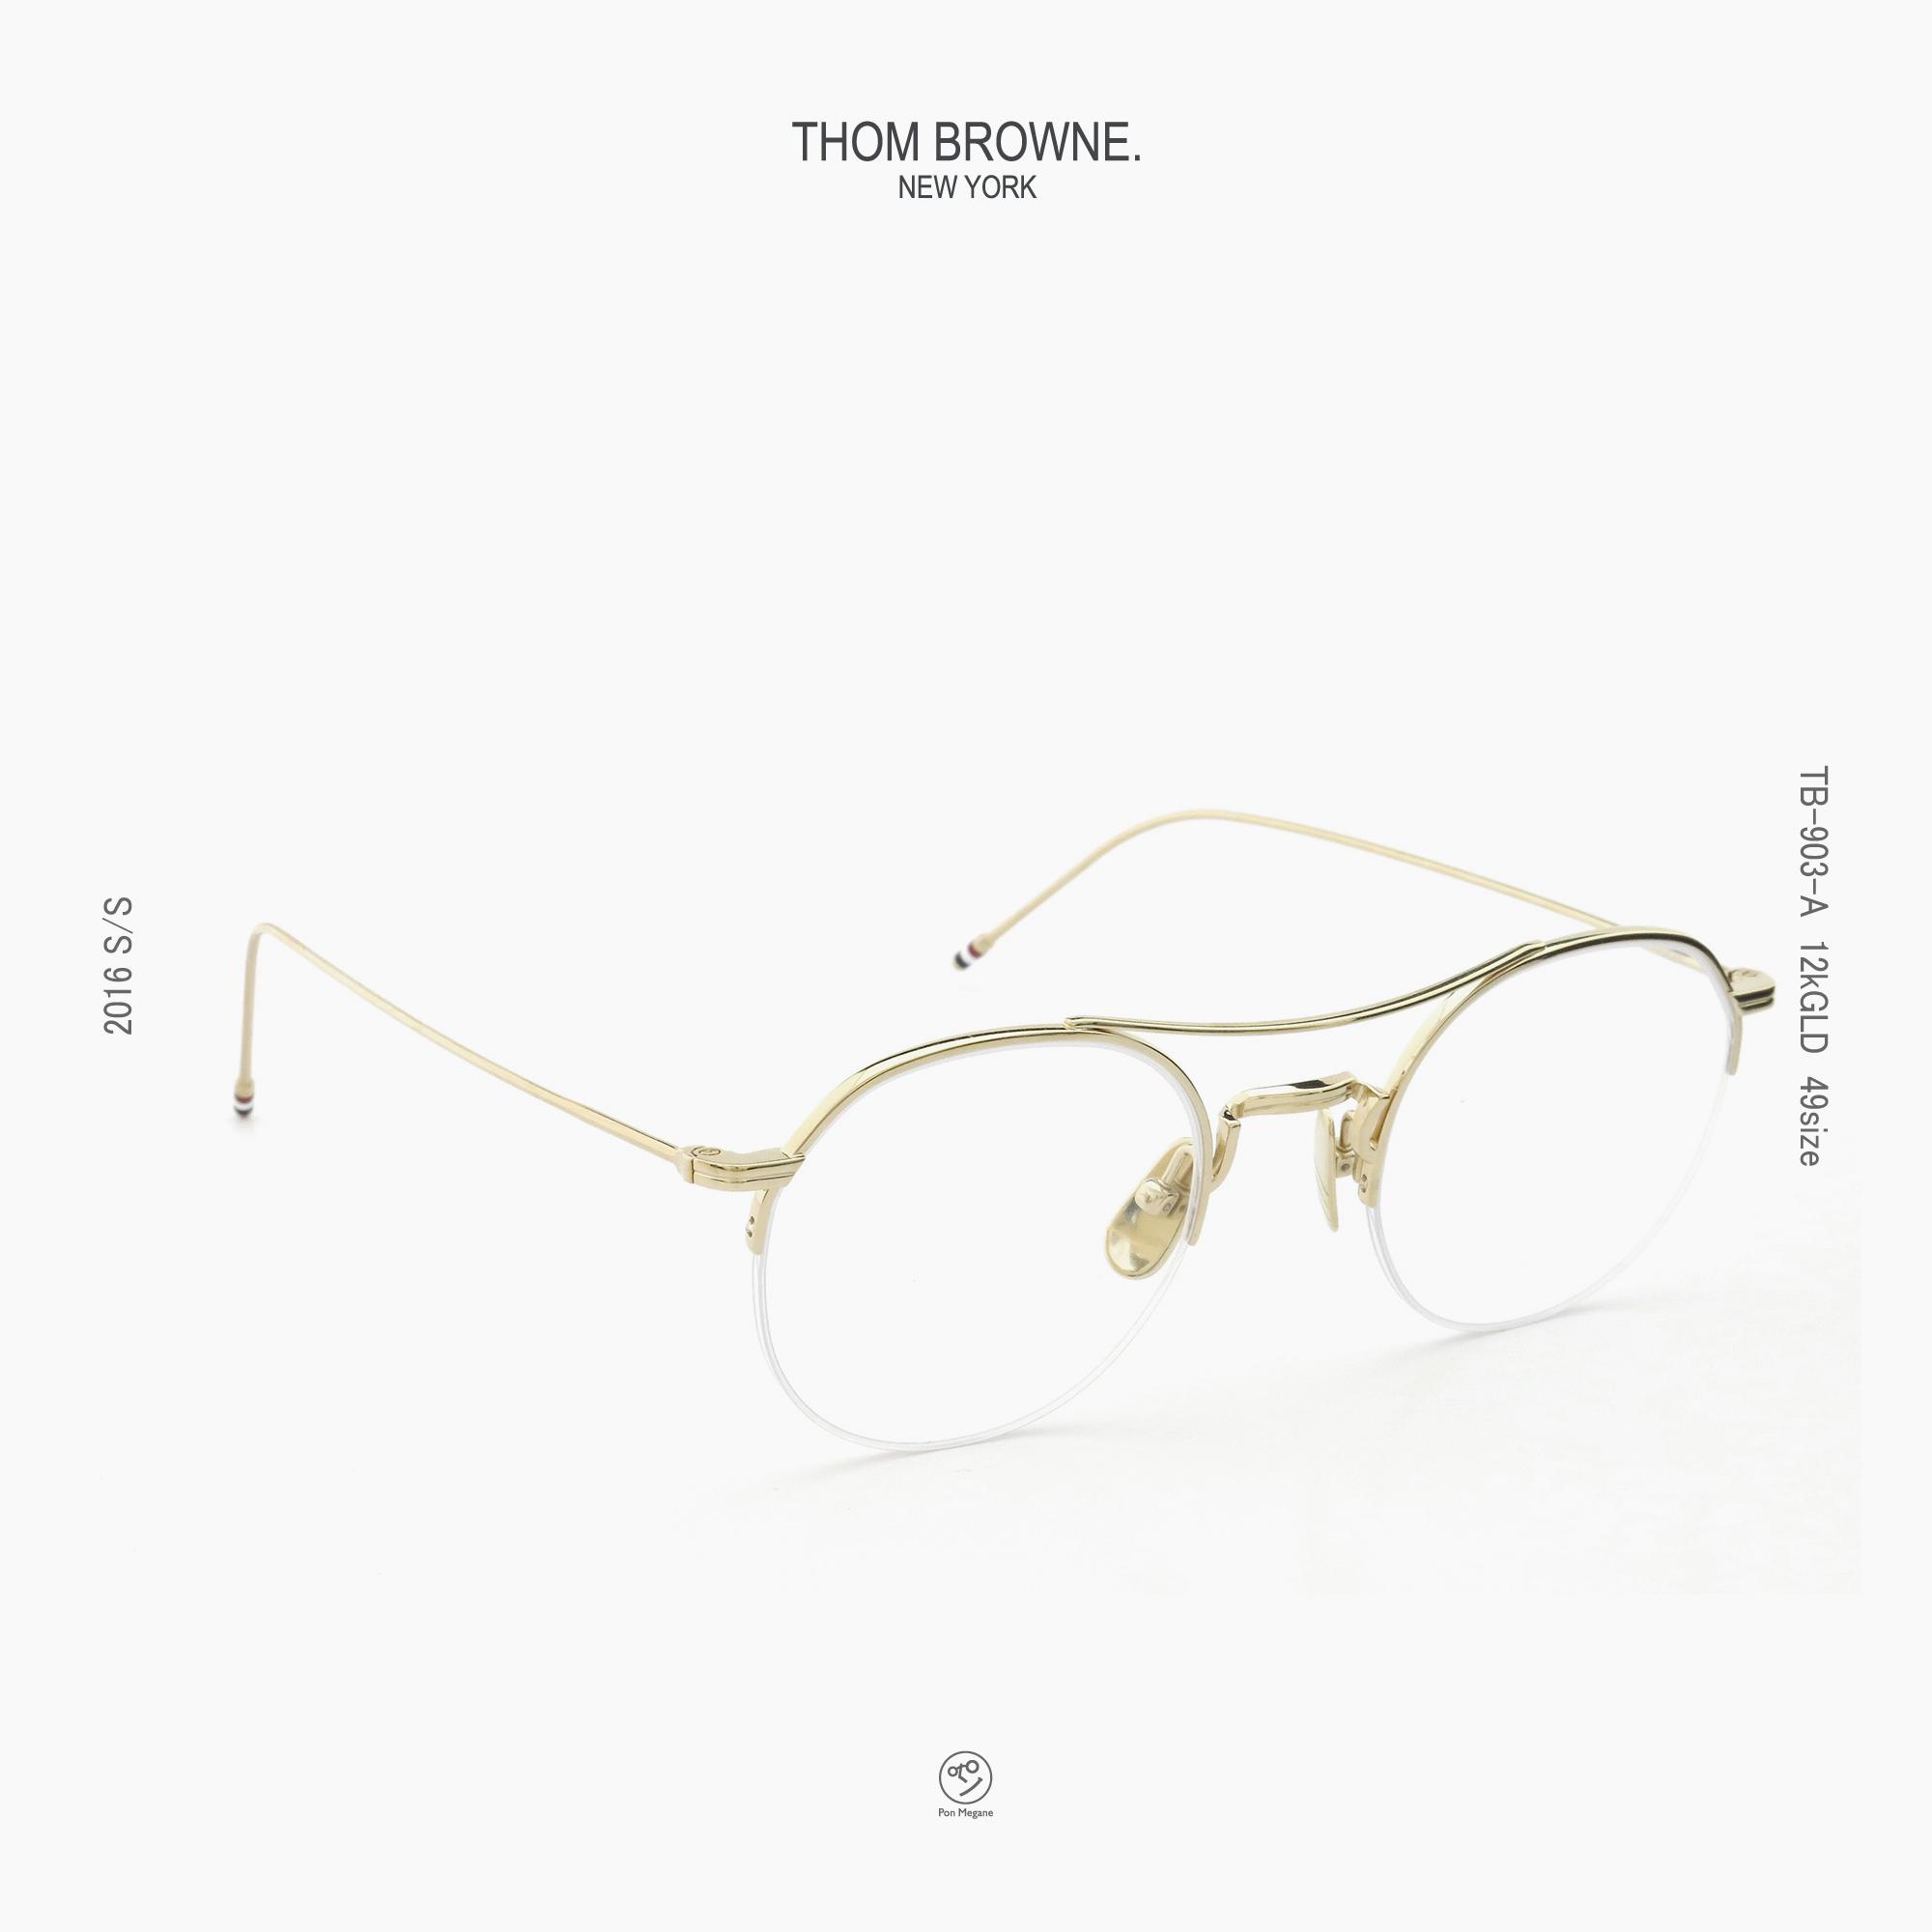 THOM-BROWNE_TB-903-A_12KGLD_49_insta